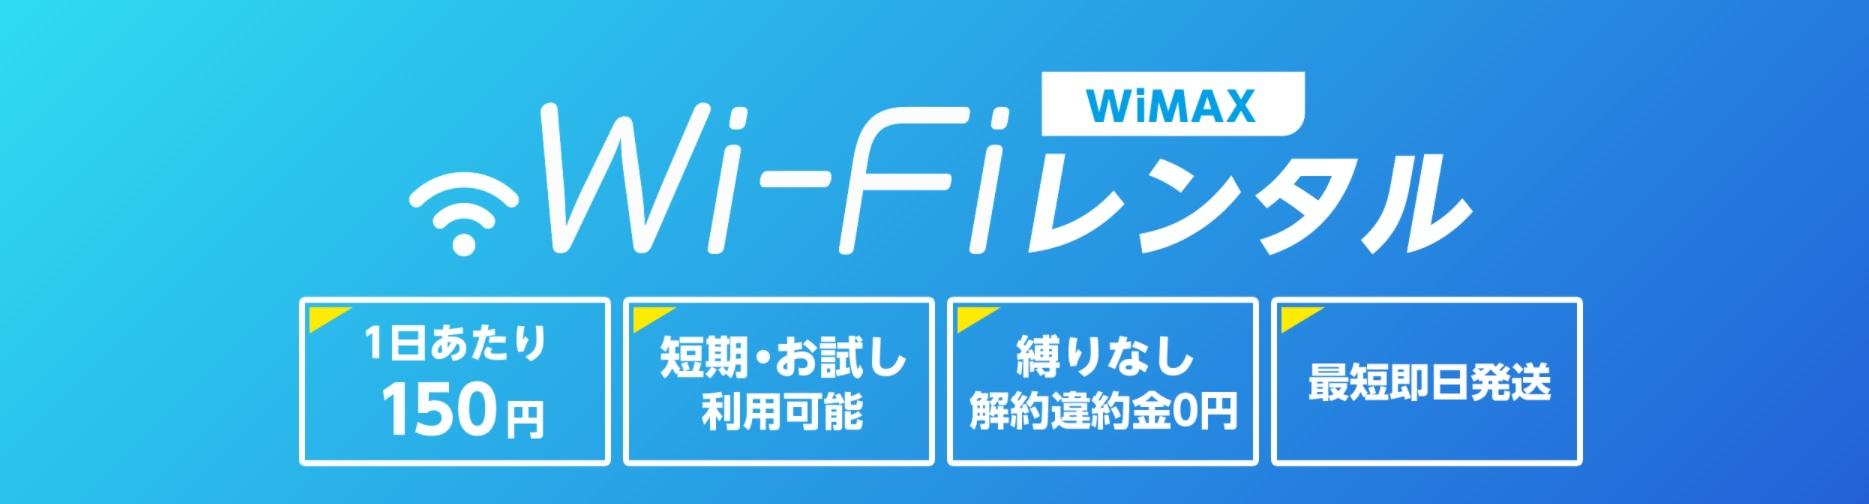 GMO Wi-Fiレンタルプラン